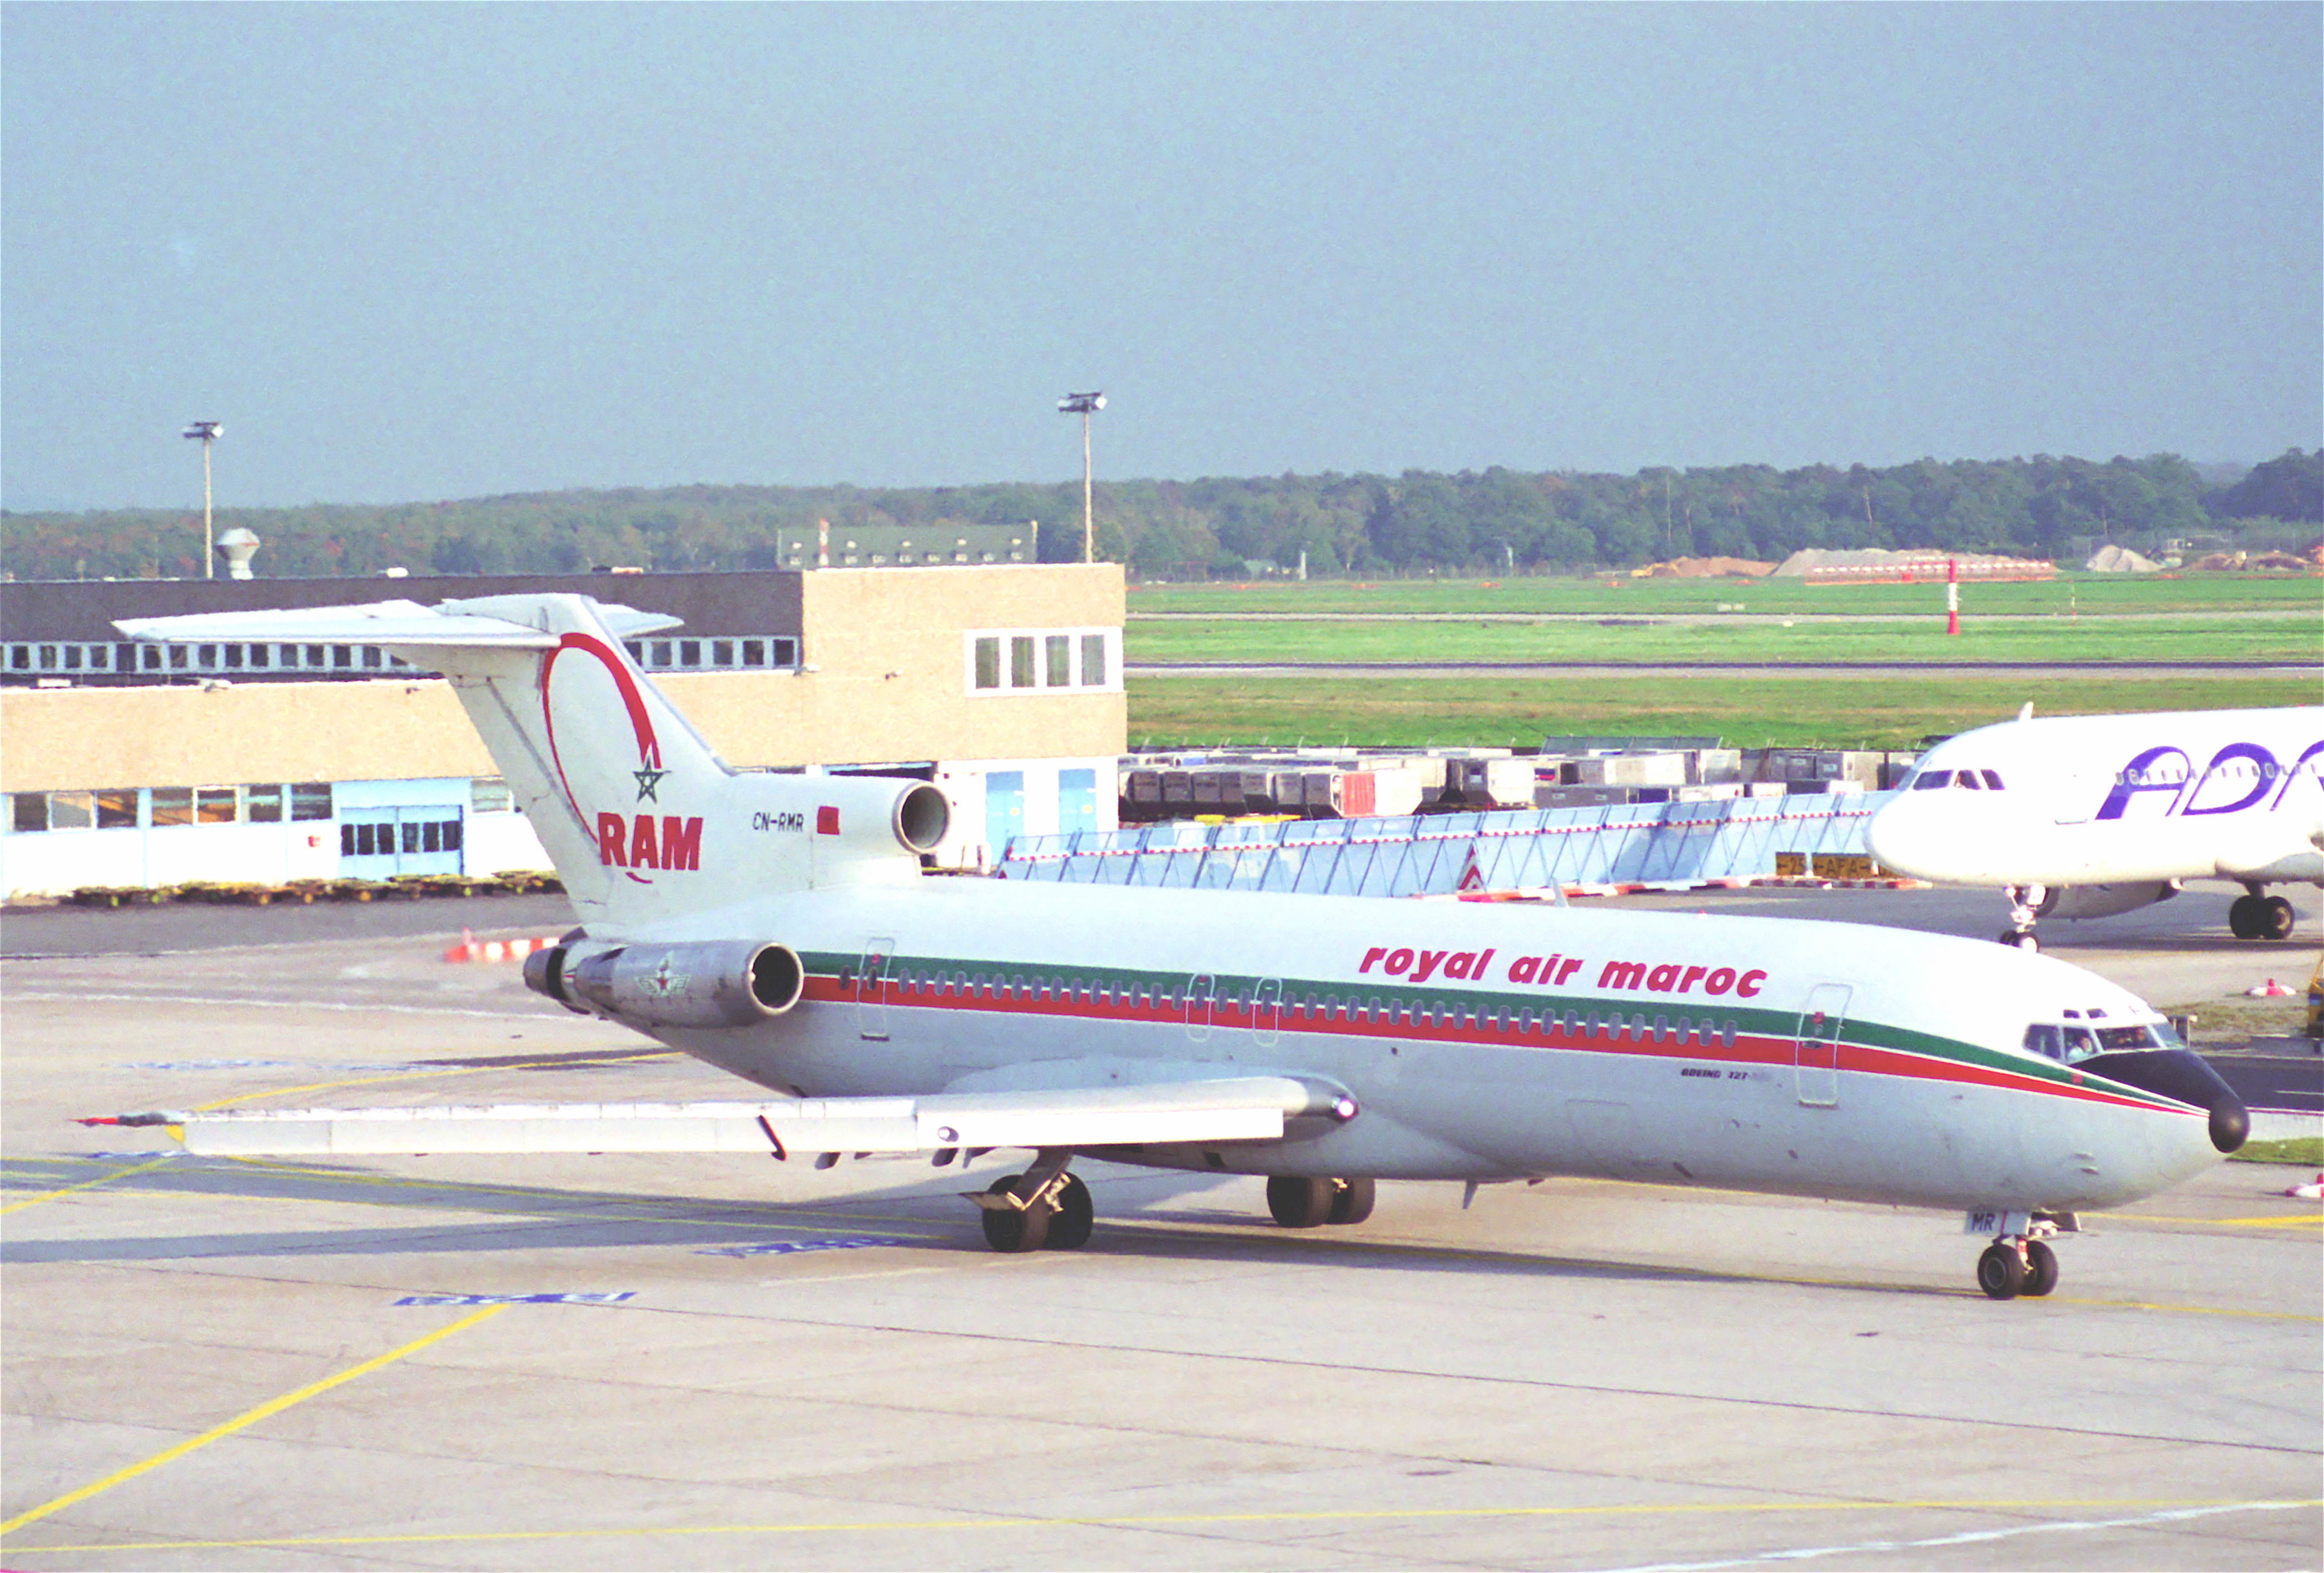 Anciens avions de la RAM - Page 2 Royal_Air_Maroc_Boeing_727-2B6%3B_CN-RMR%40FRA%3B10.10.1995_%286083608995%29